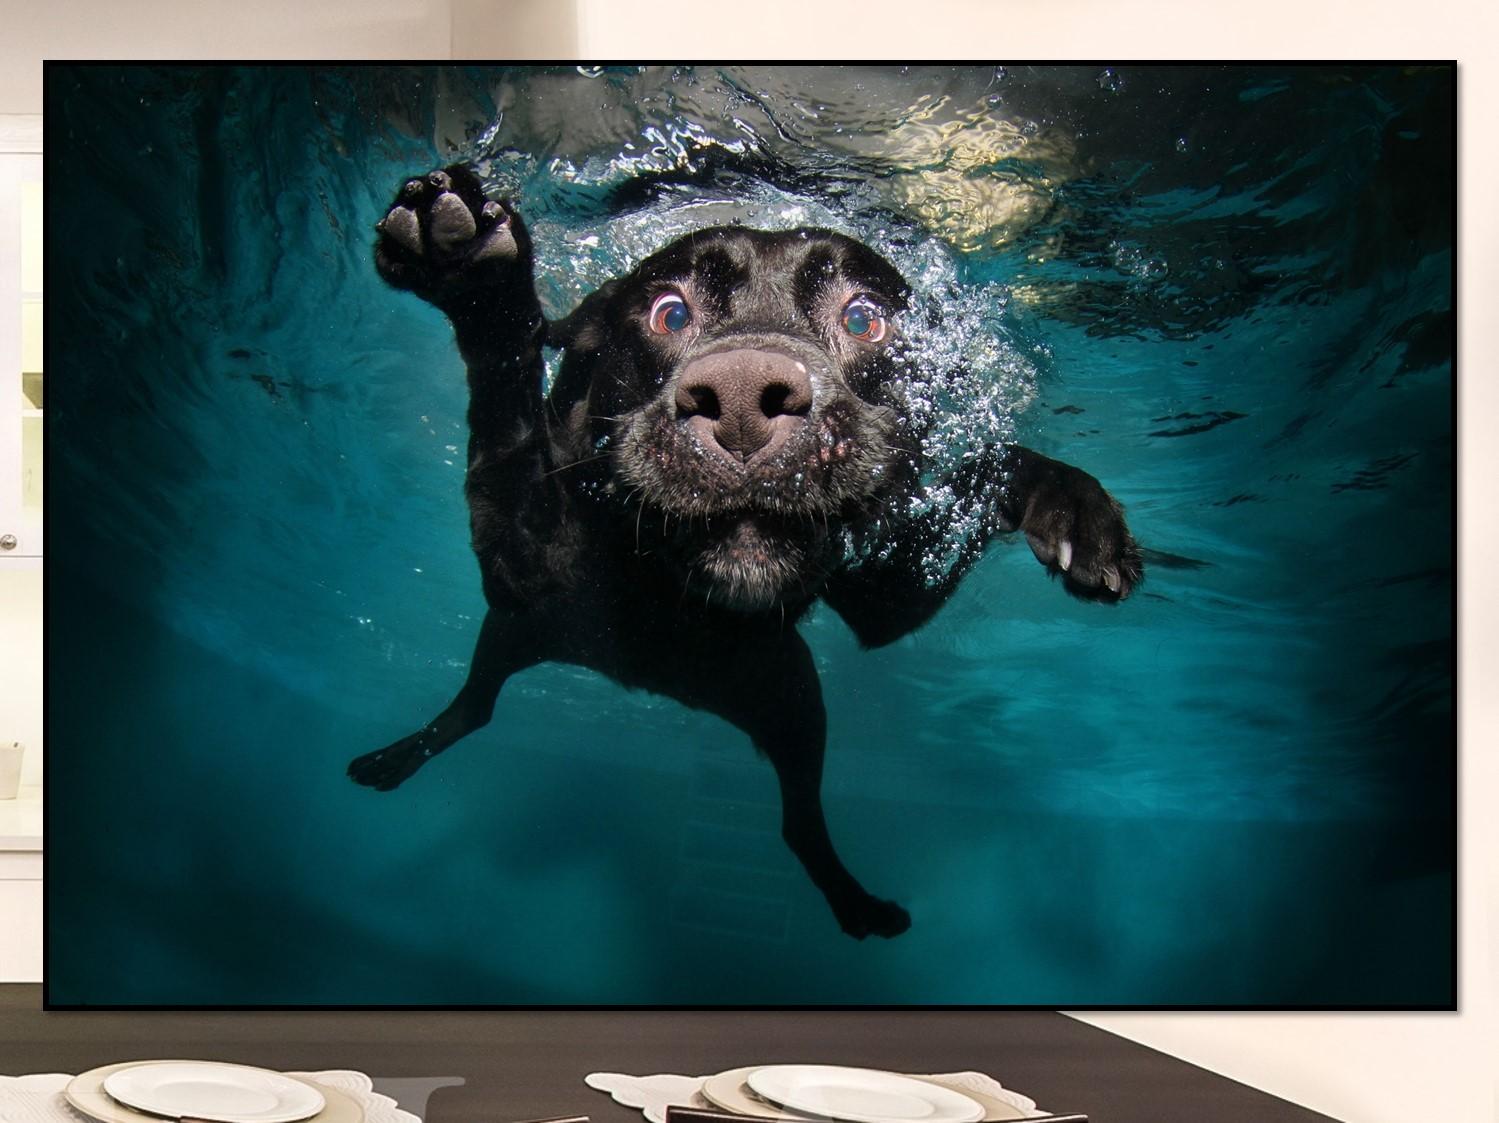 Dog Swim Home Art High Quality Giclee Prints on Canvas